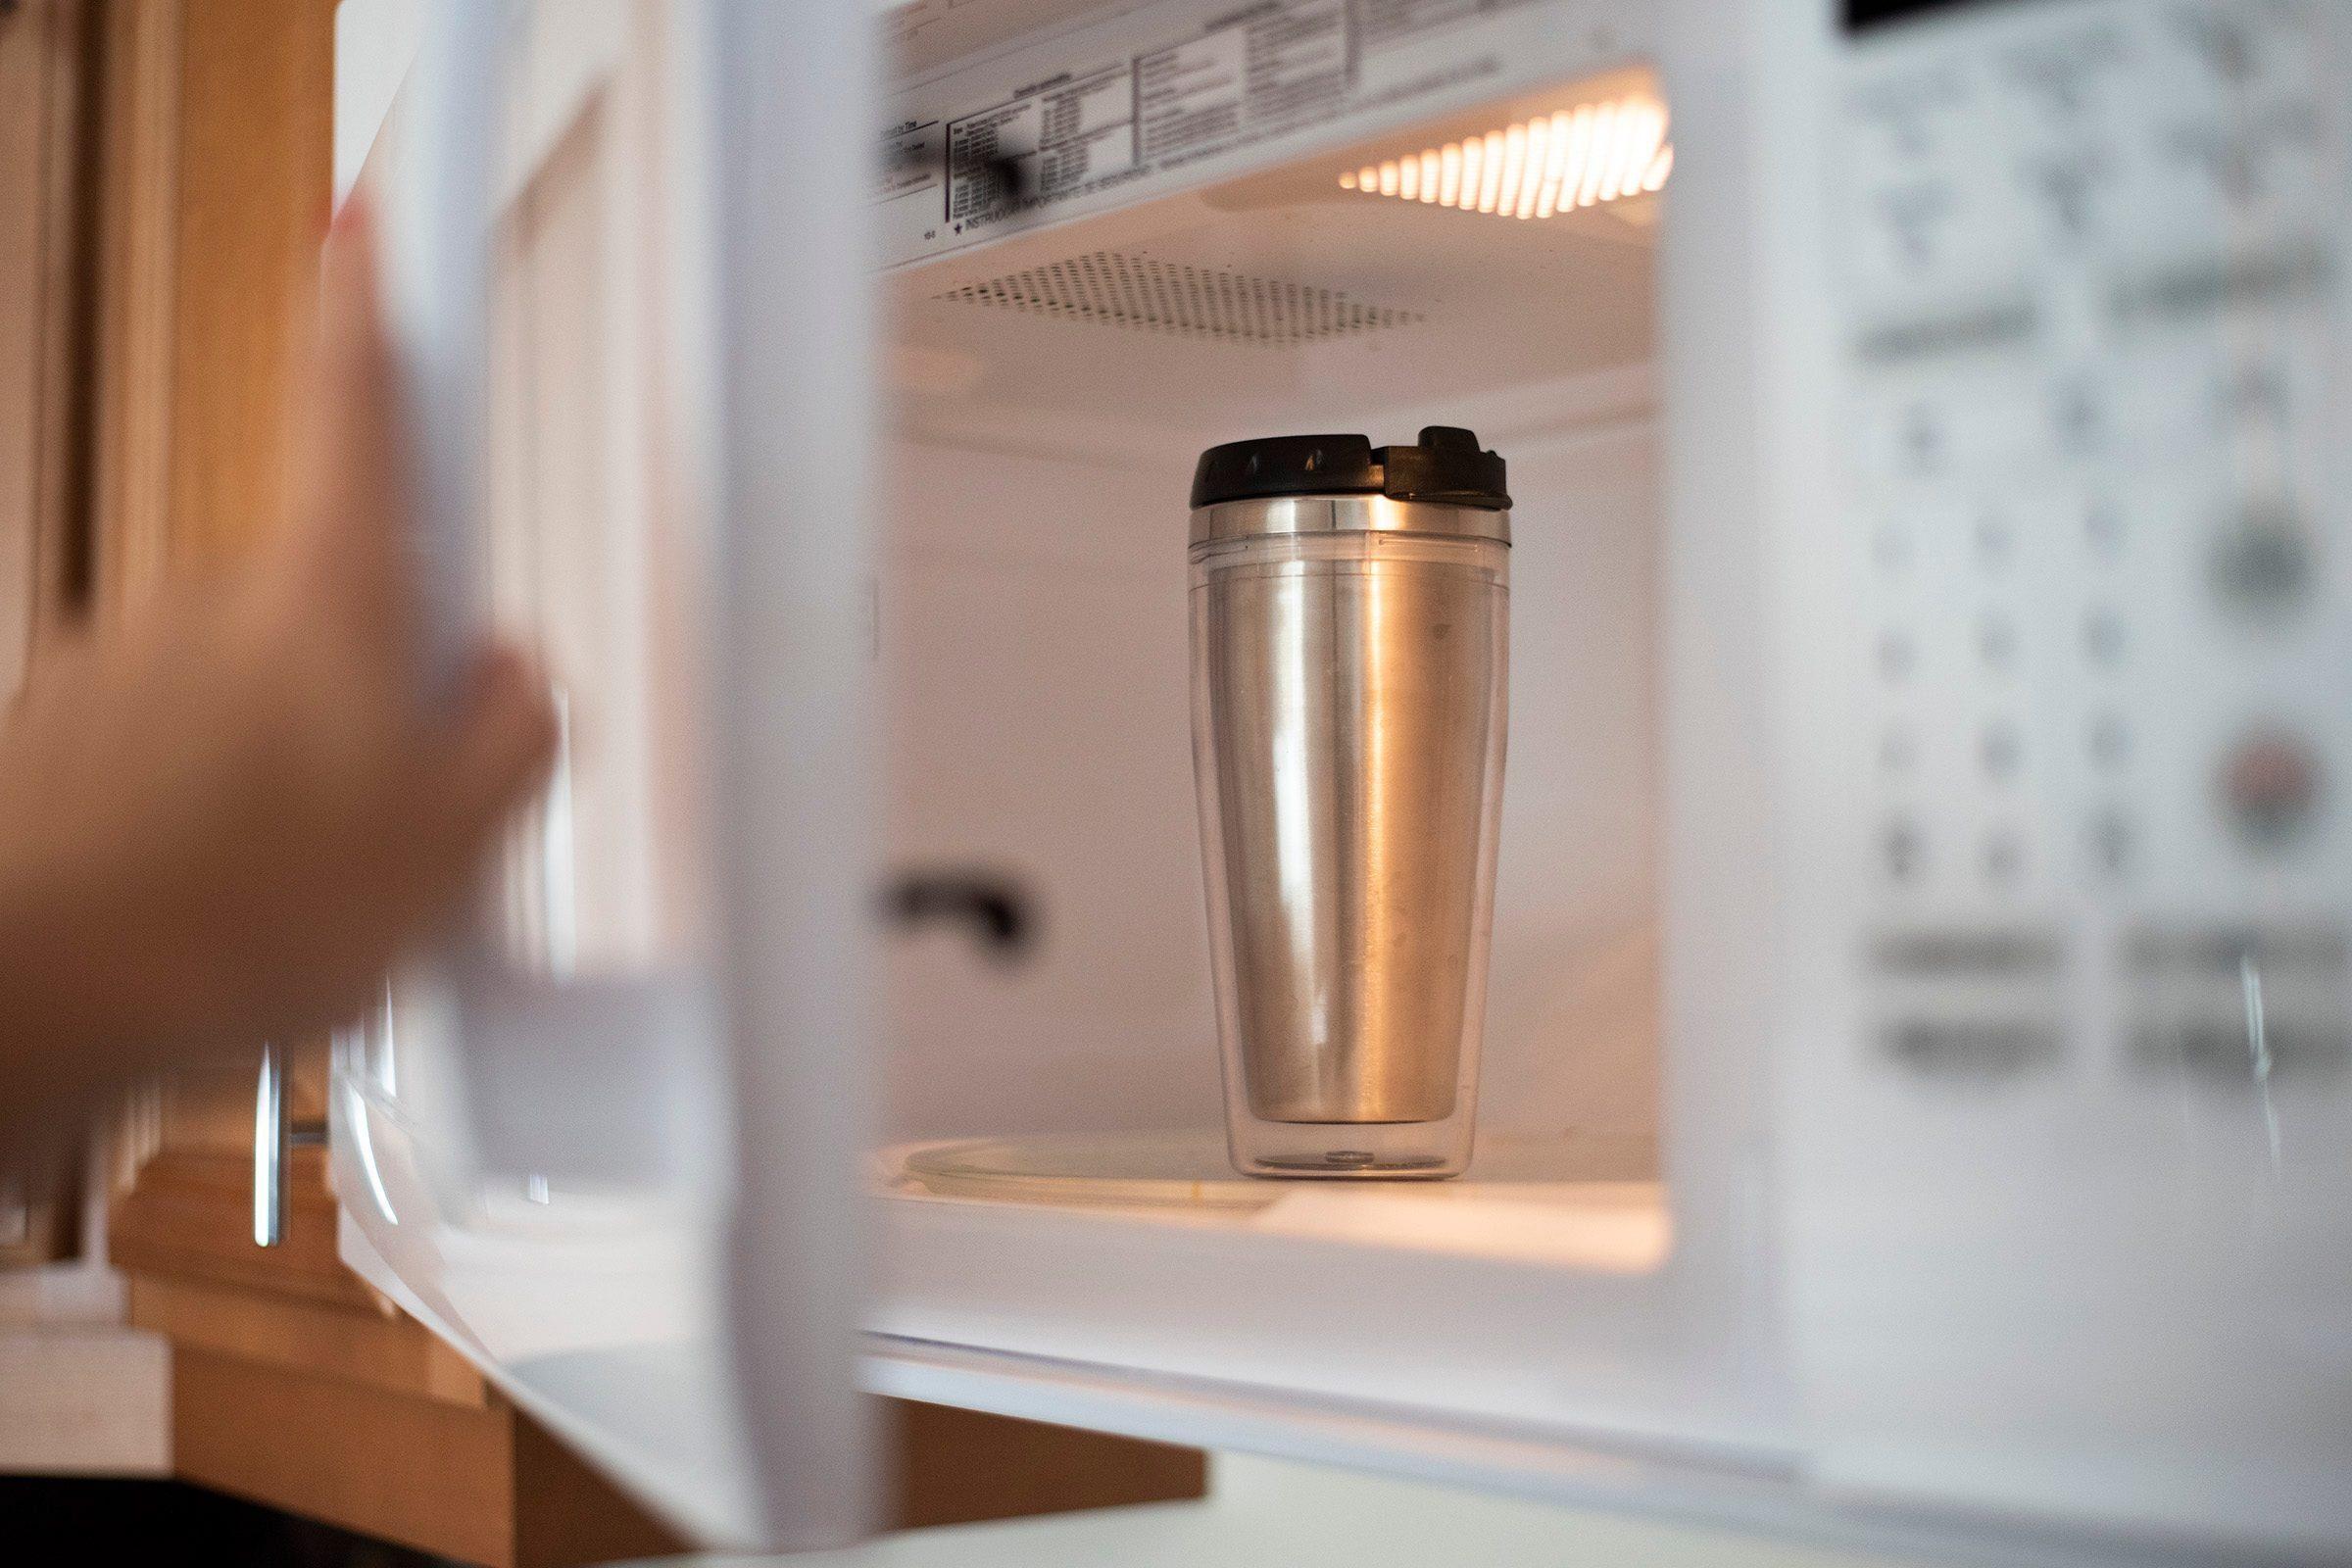 microwave stainless steel mug